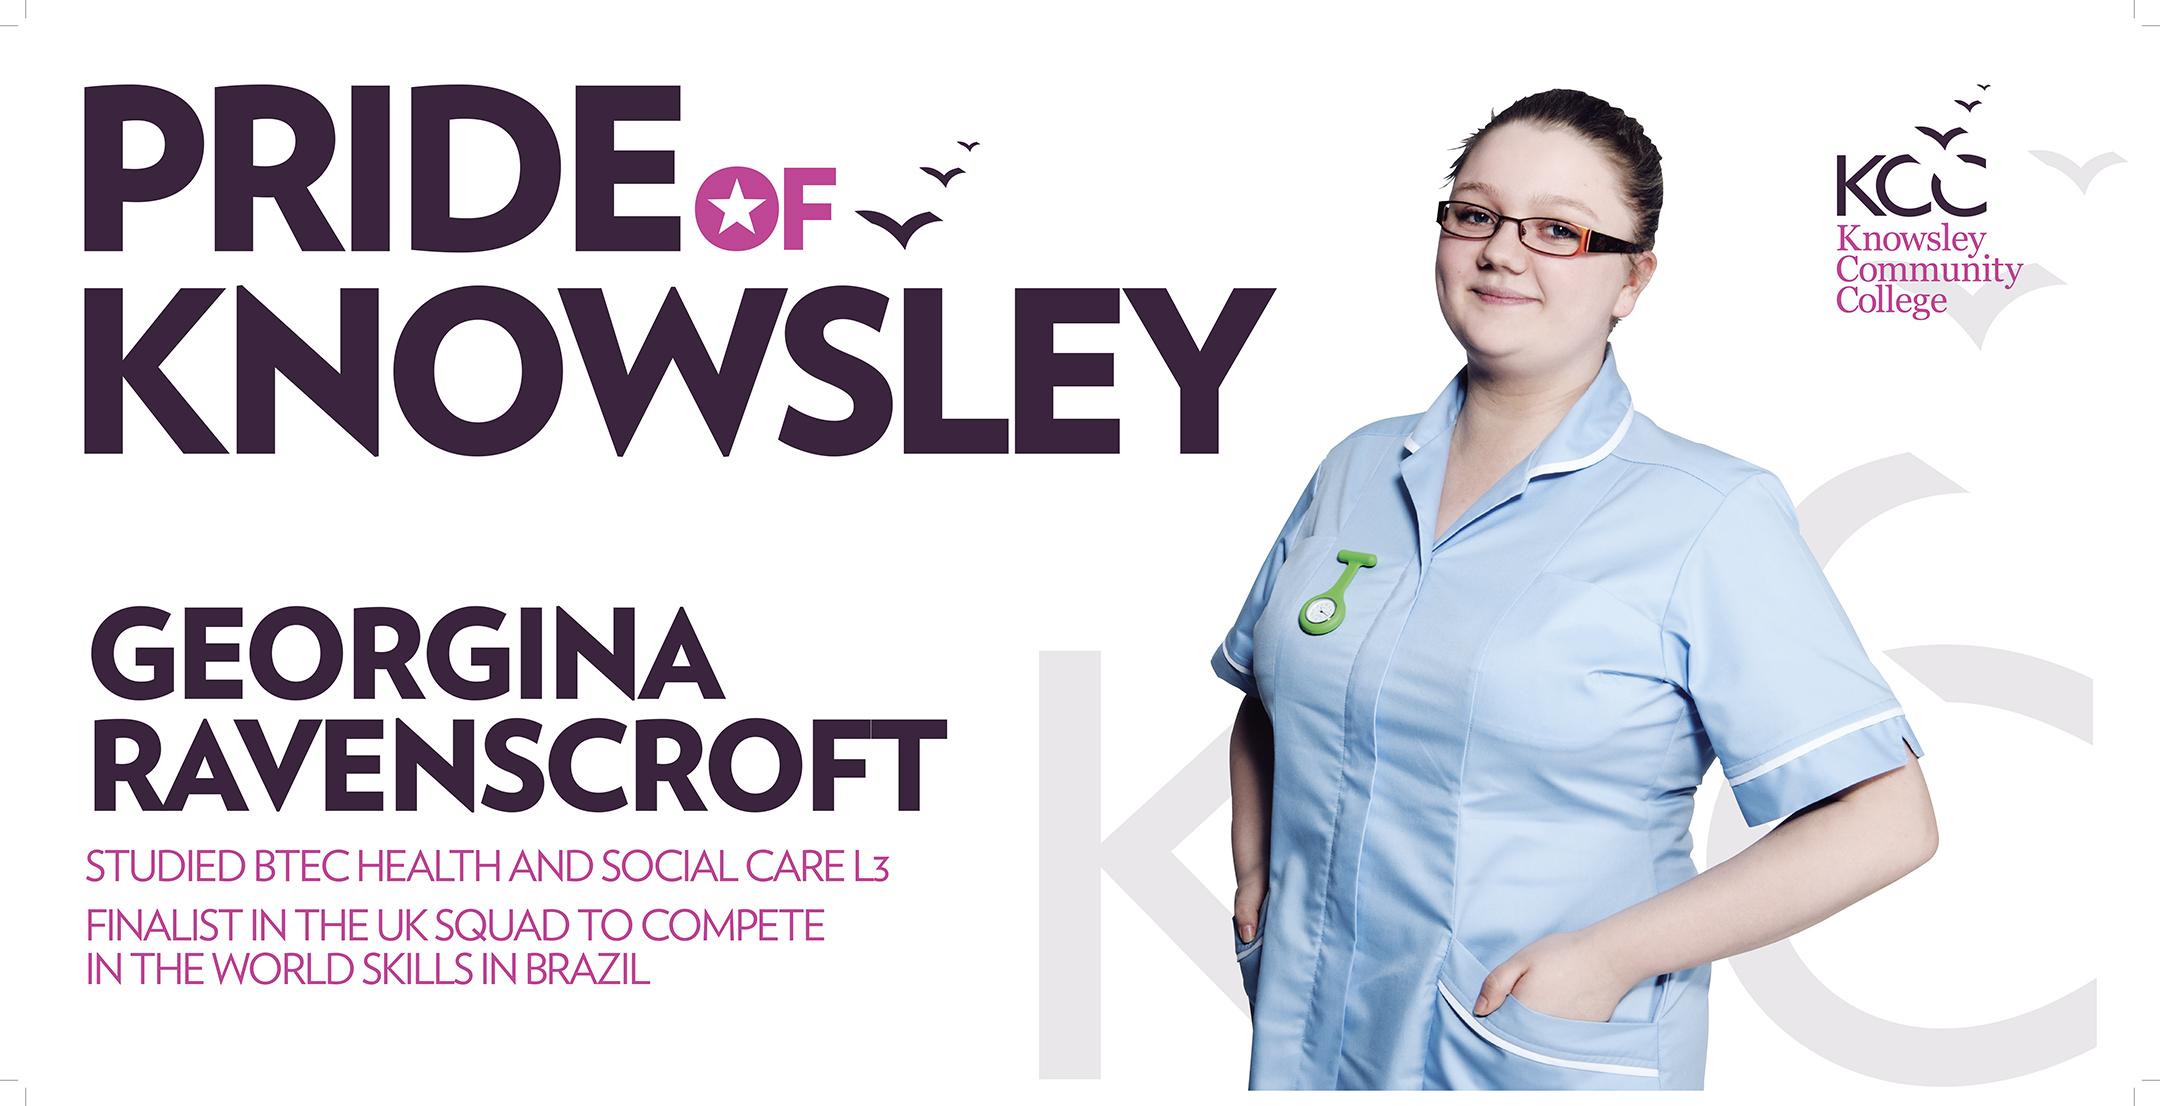 Pride of Knowsley Campaign